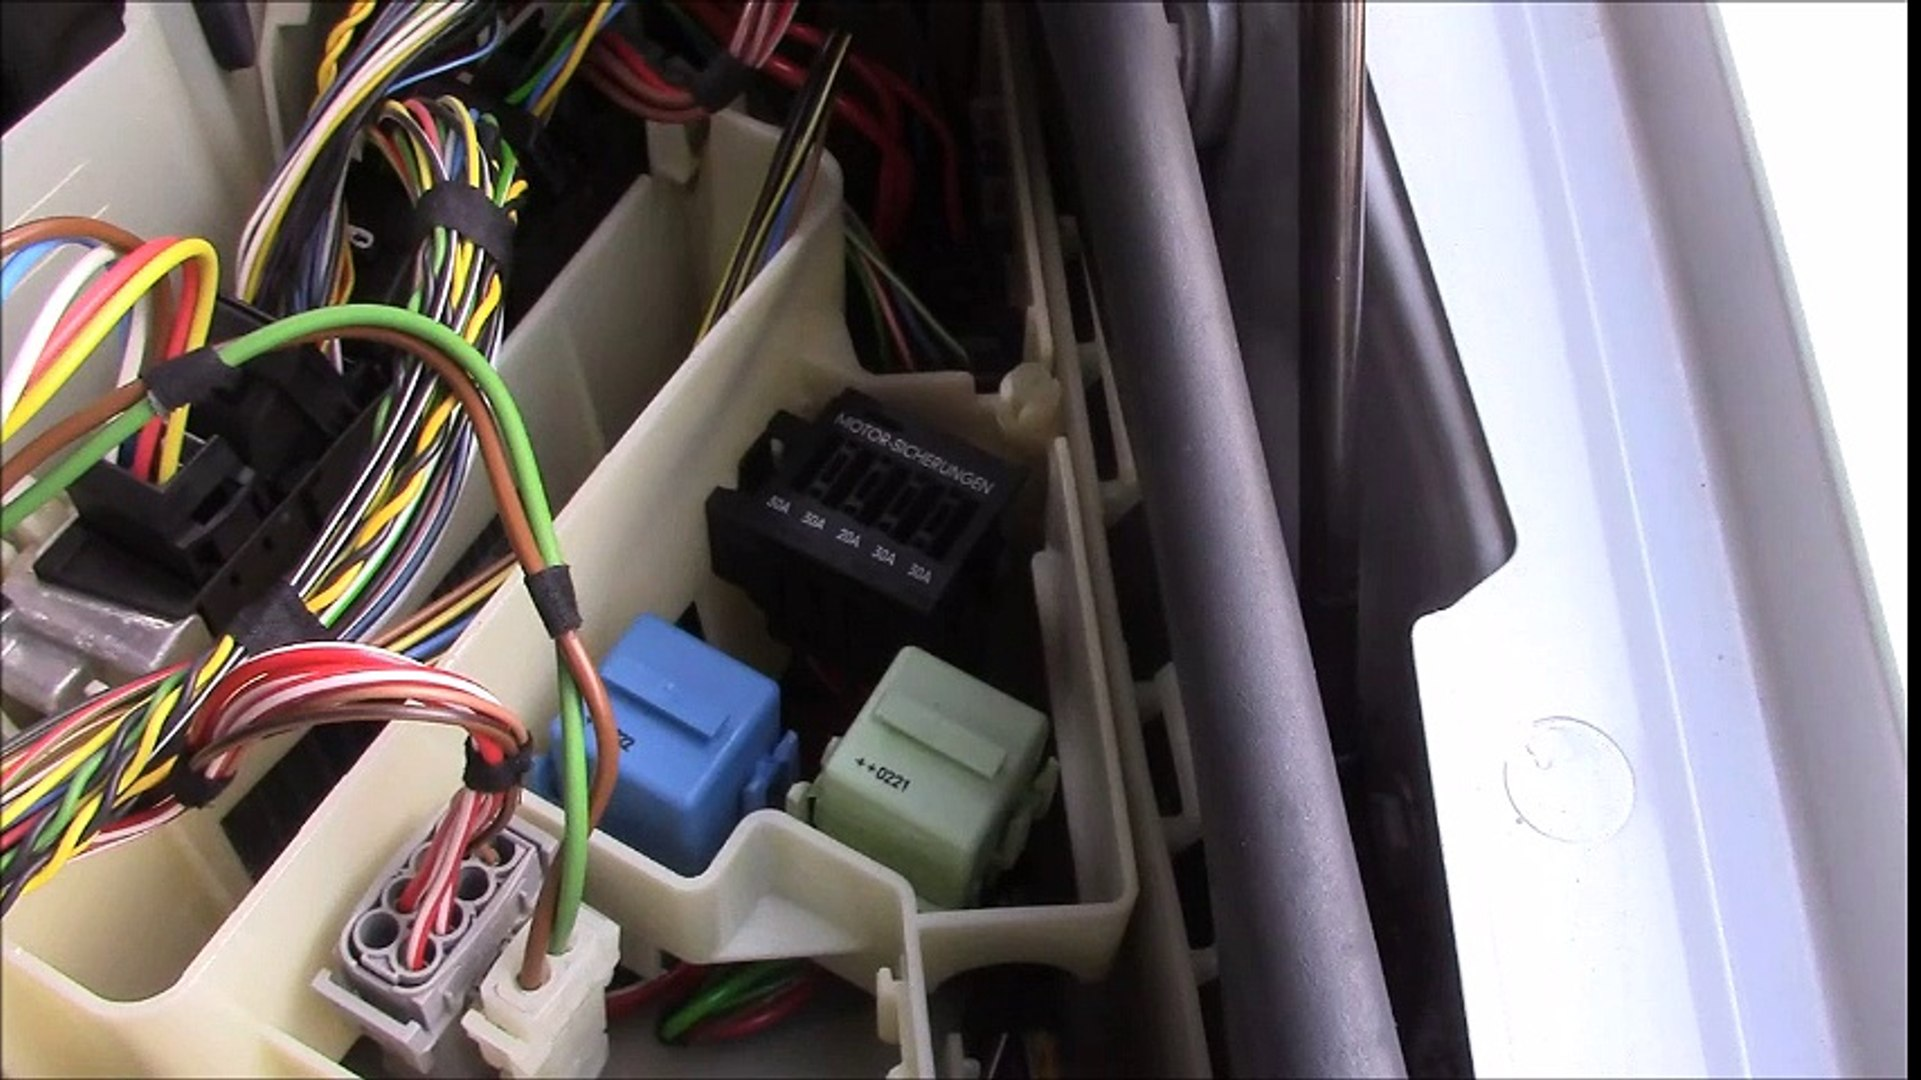 Swell Bmw E46 3 Series Crank No Start No Fuel Pressure Or Pump Noise Wiring Cloud Hemtegremohammedshrineorg